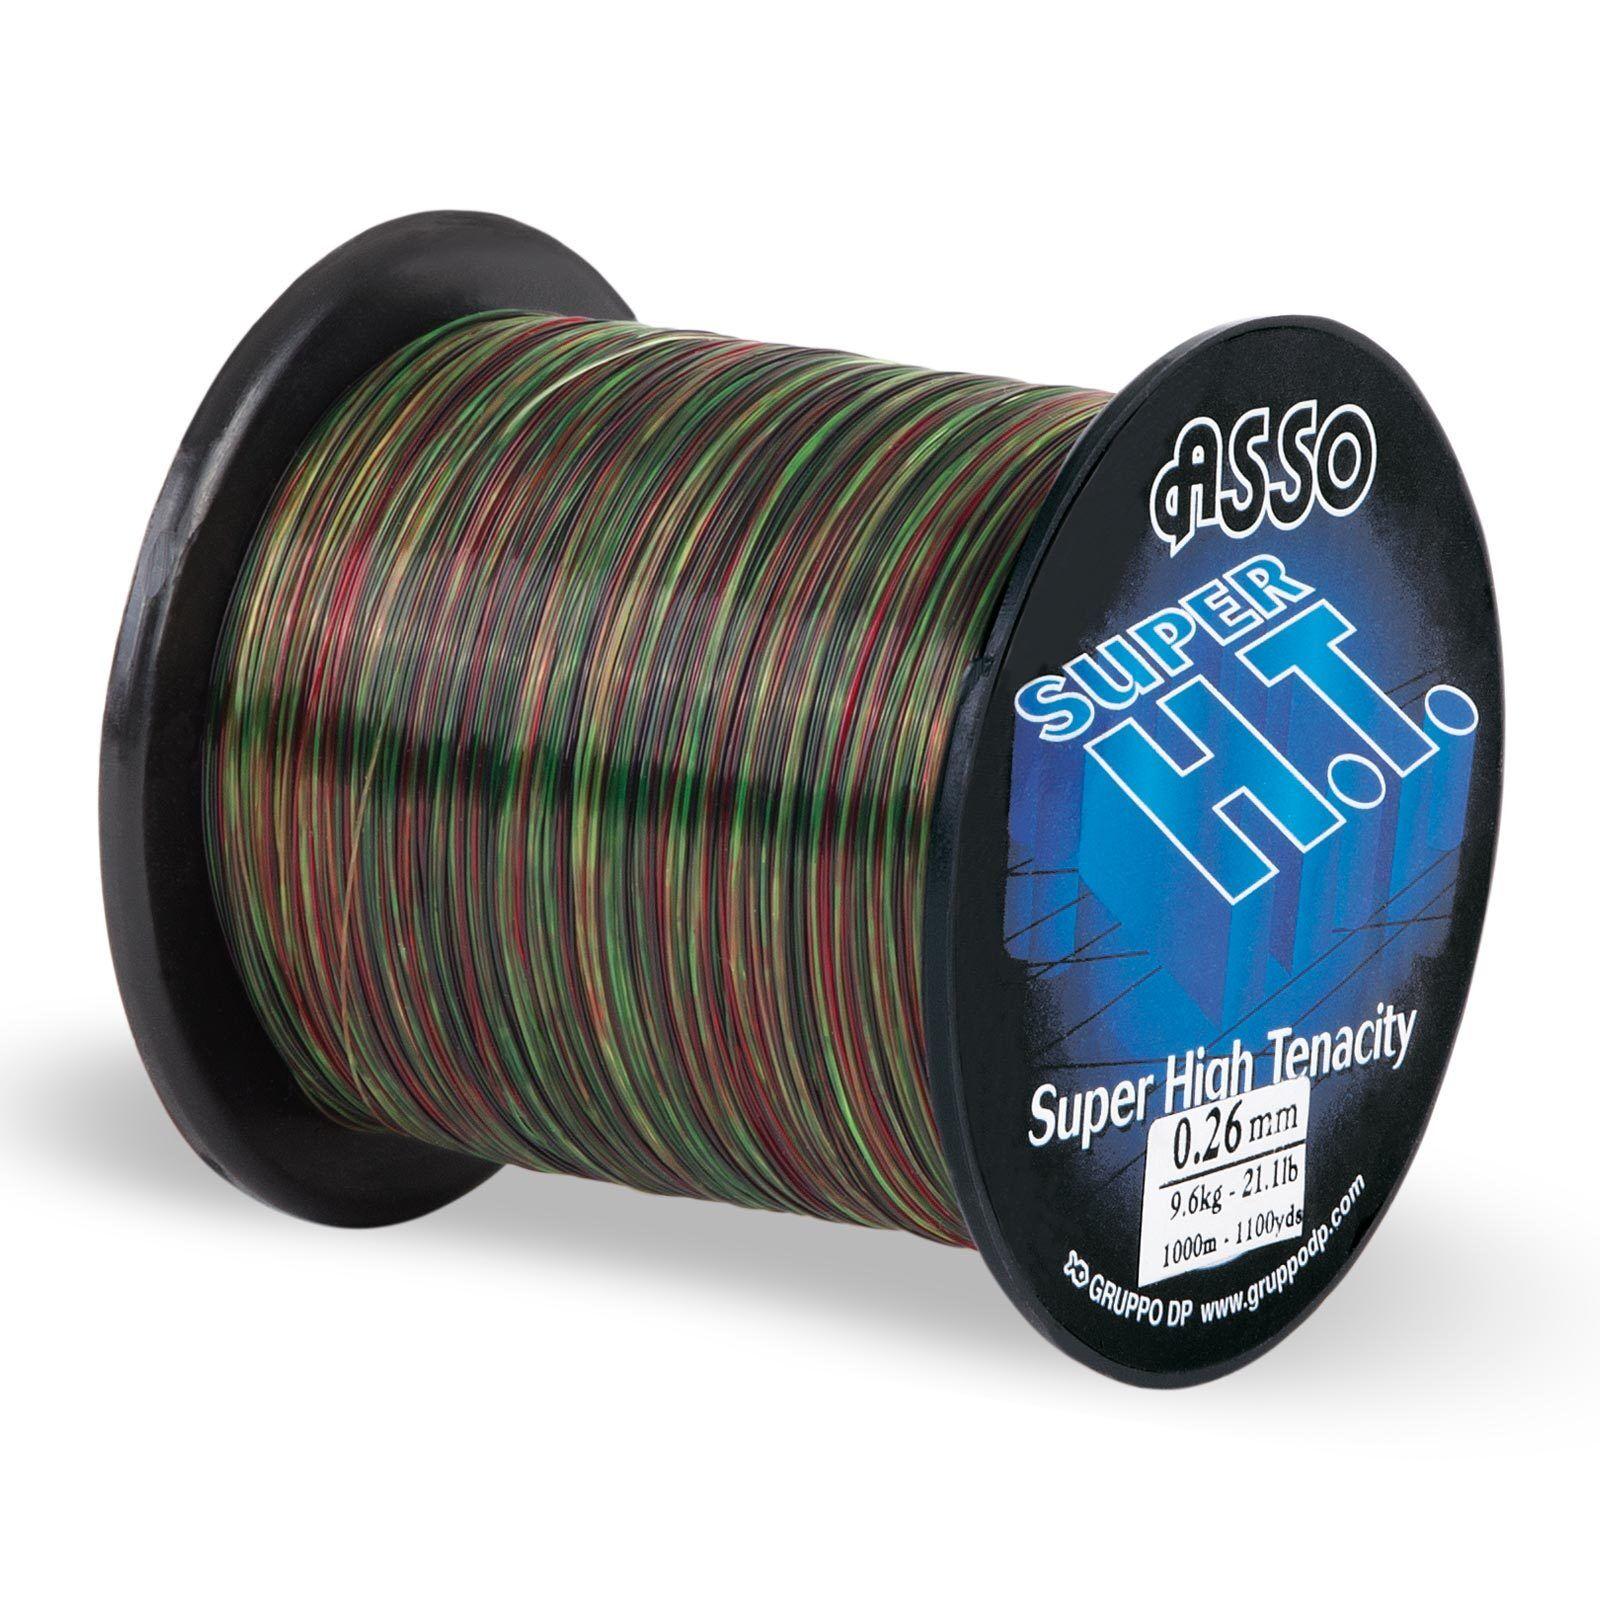 (0,04EUR m) ASSO Angelschnur Profi - Super High Tenacity 1000m 0,40mm Camo